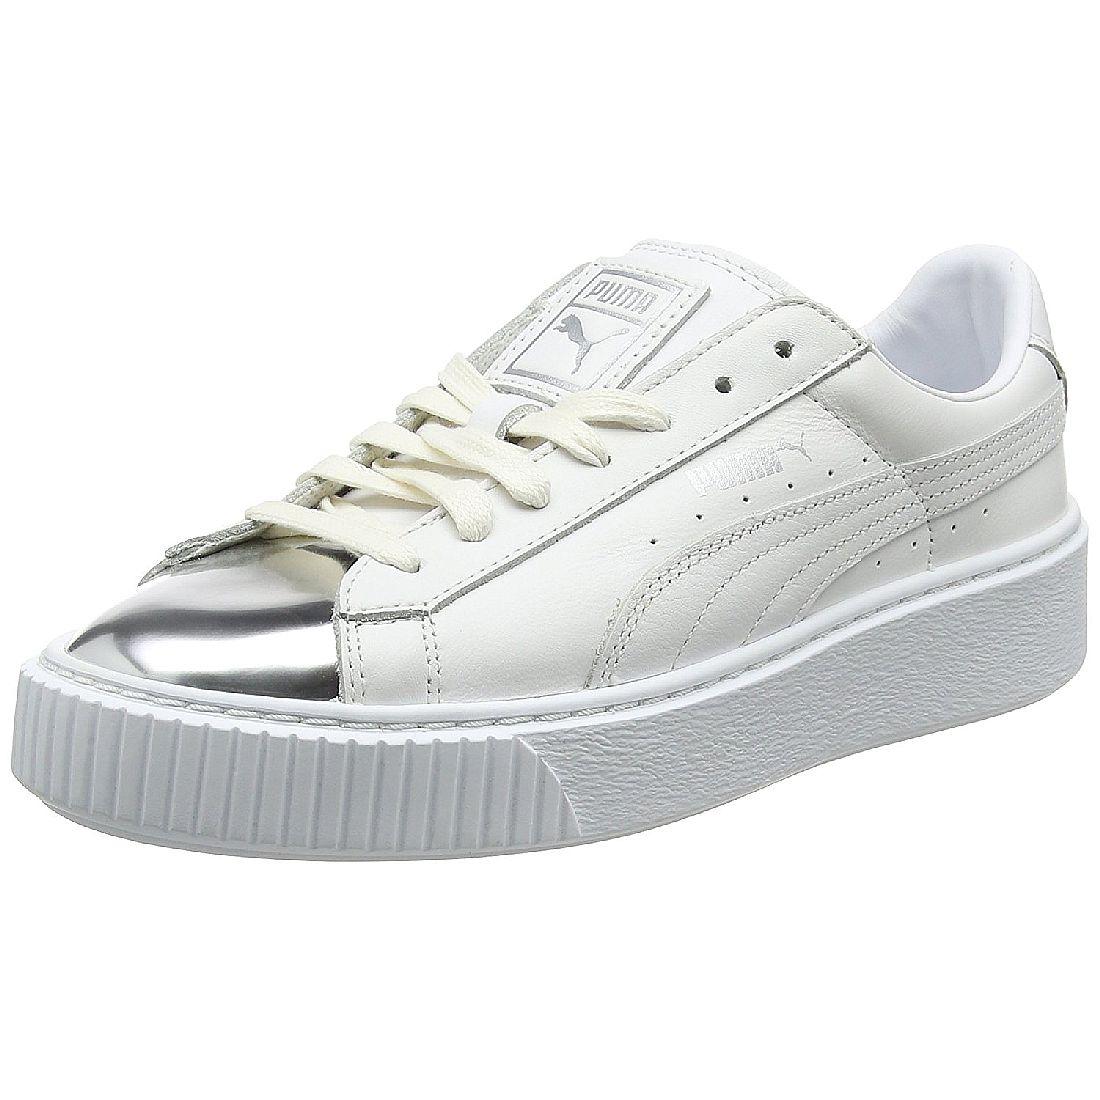 Puma – Basket – Sneaker in Silber Metallic mit Plateausohle